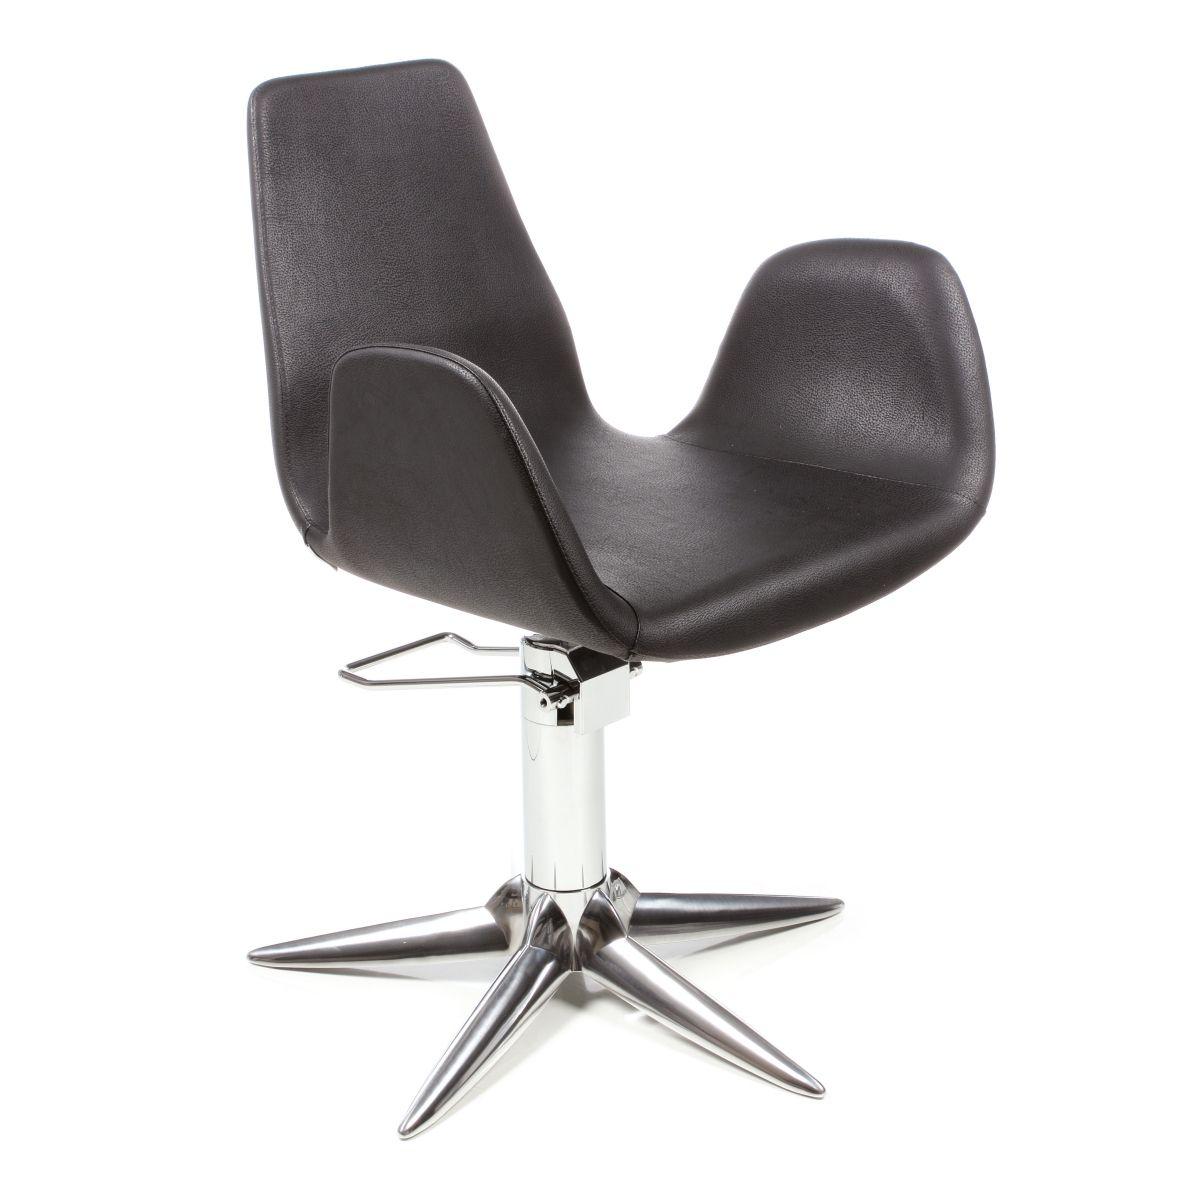 Phenomenal Nysa Black Parrot Dailytribune Chair Design For Home Dailytribuneorg